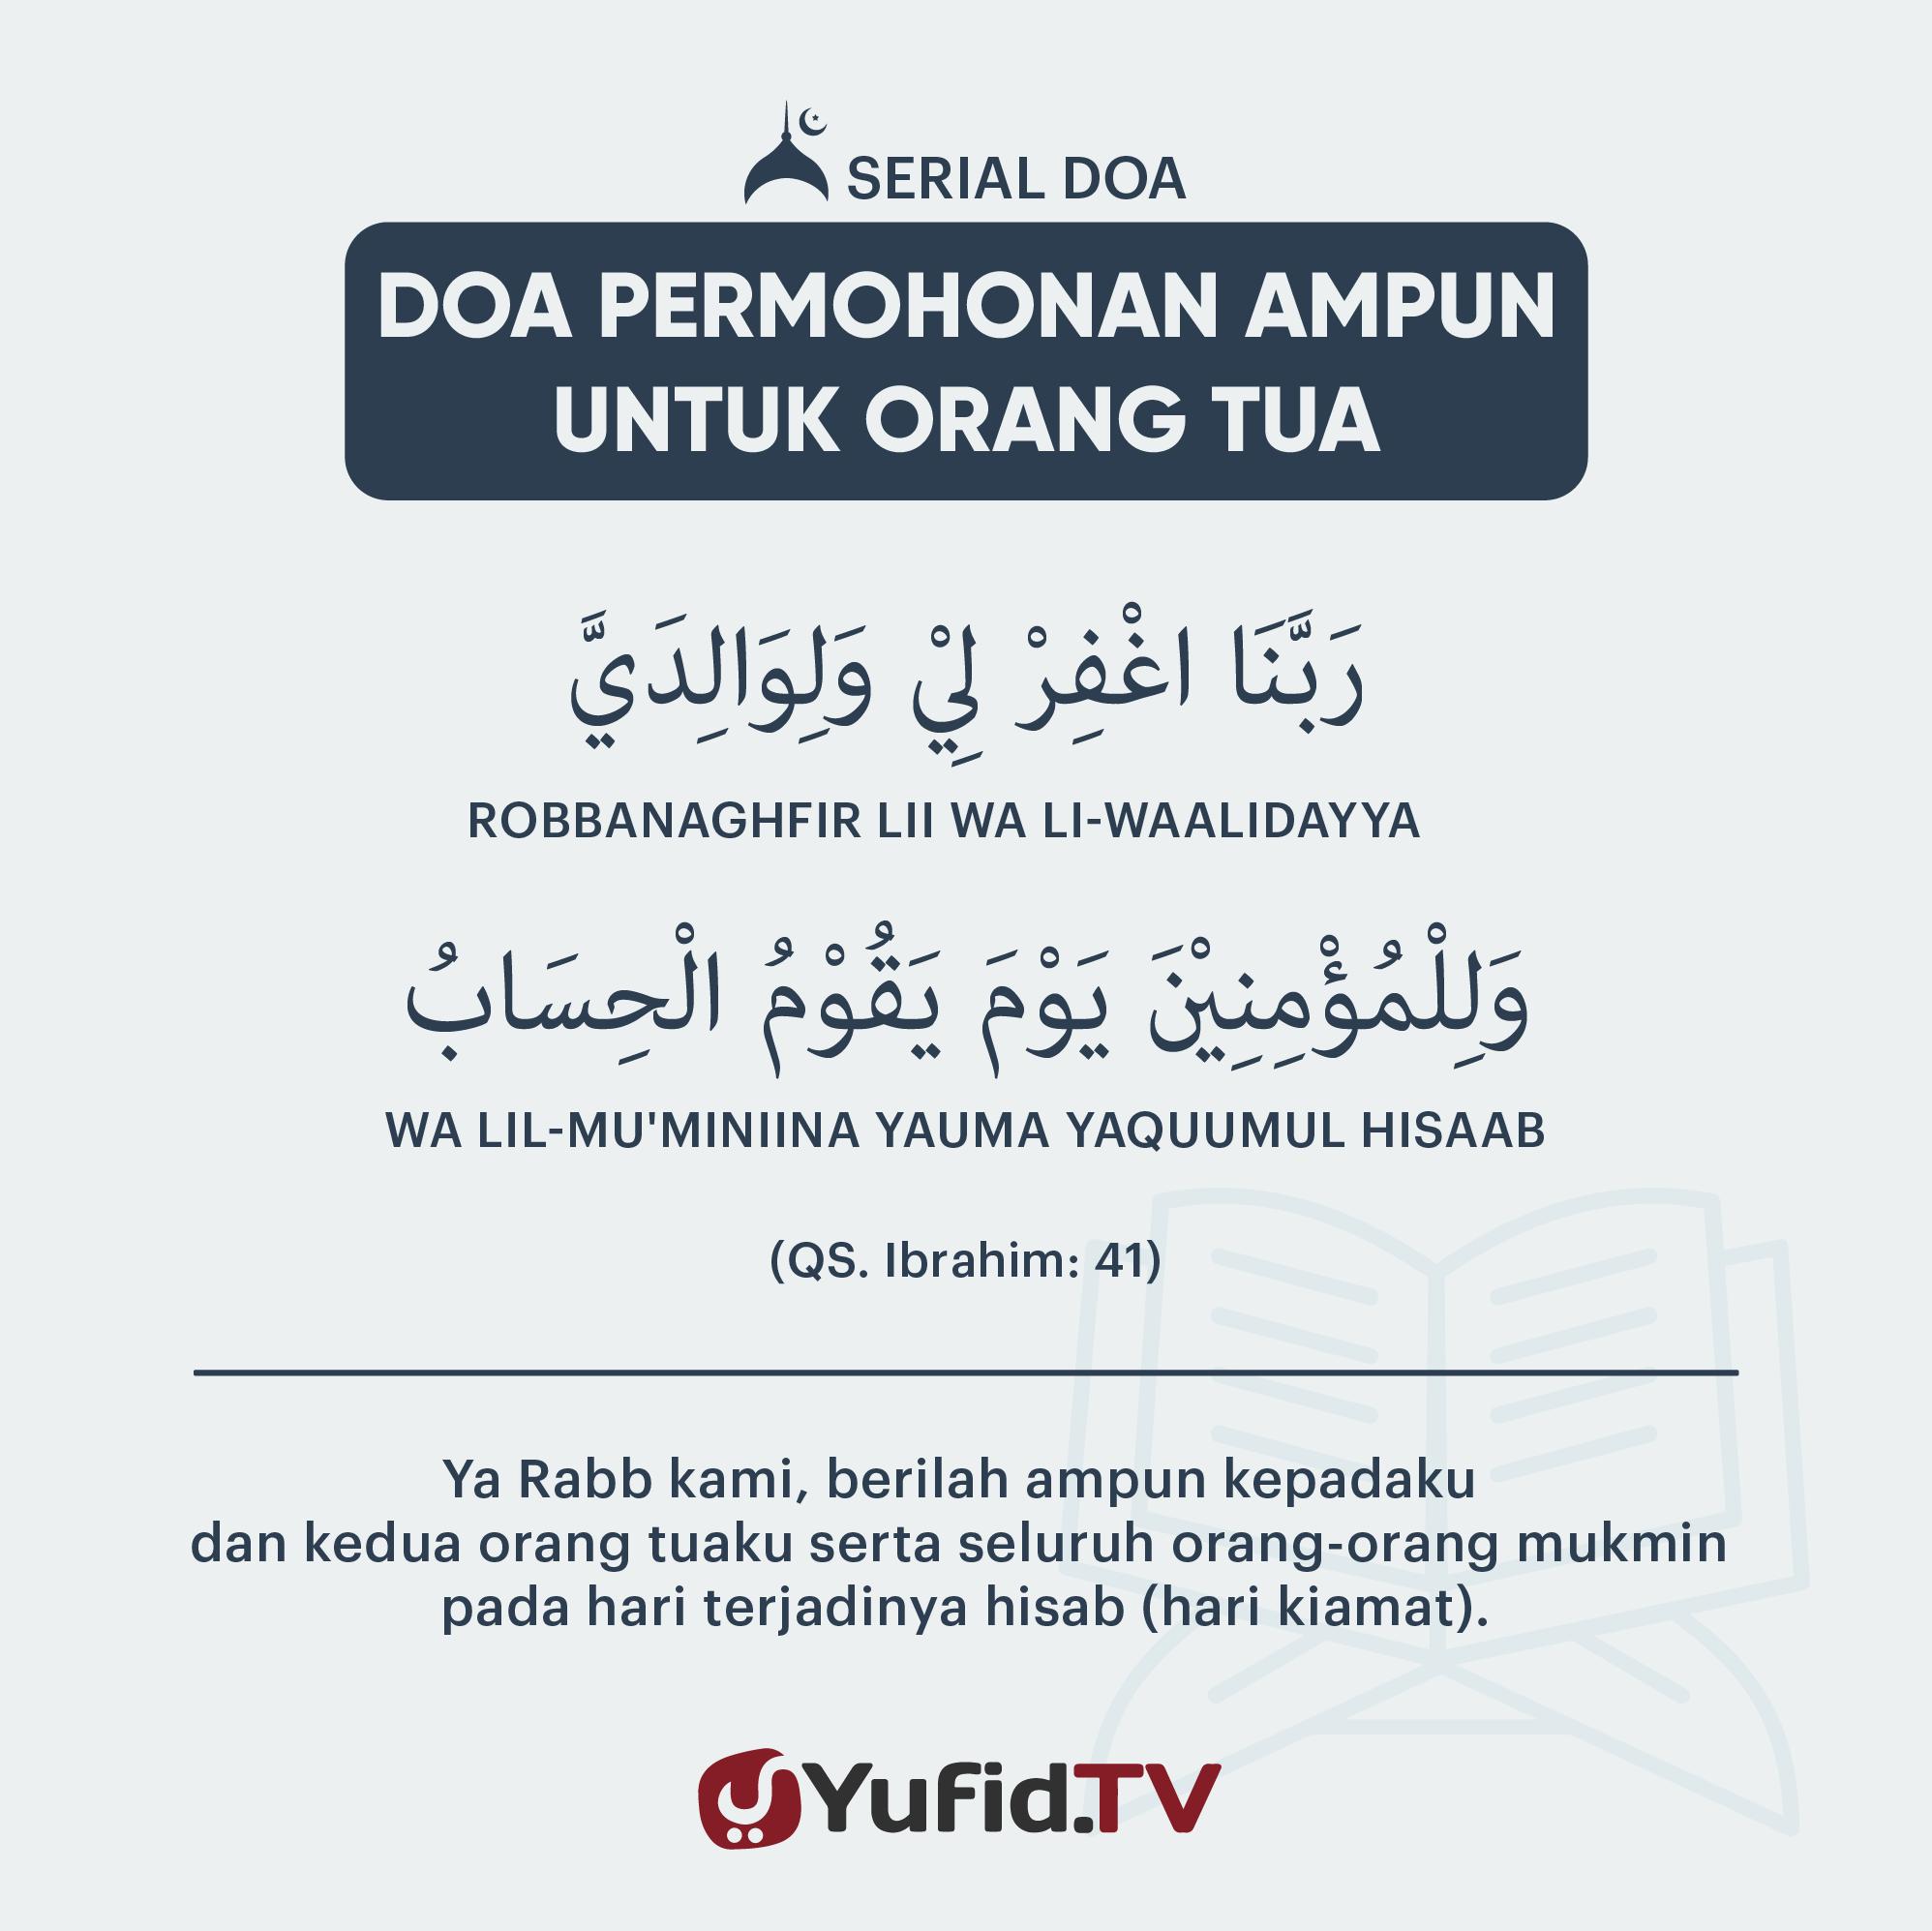 Doa Permohonan Ampun Untuk Orang Tua